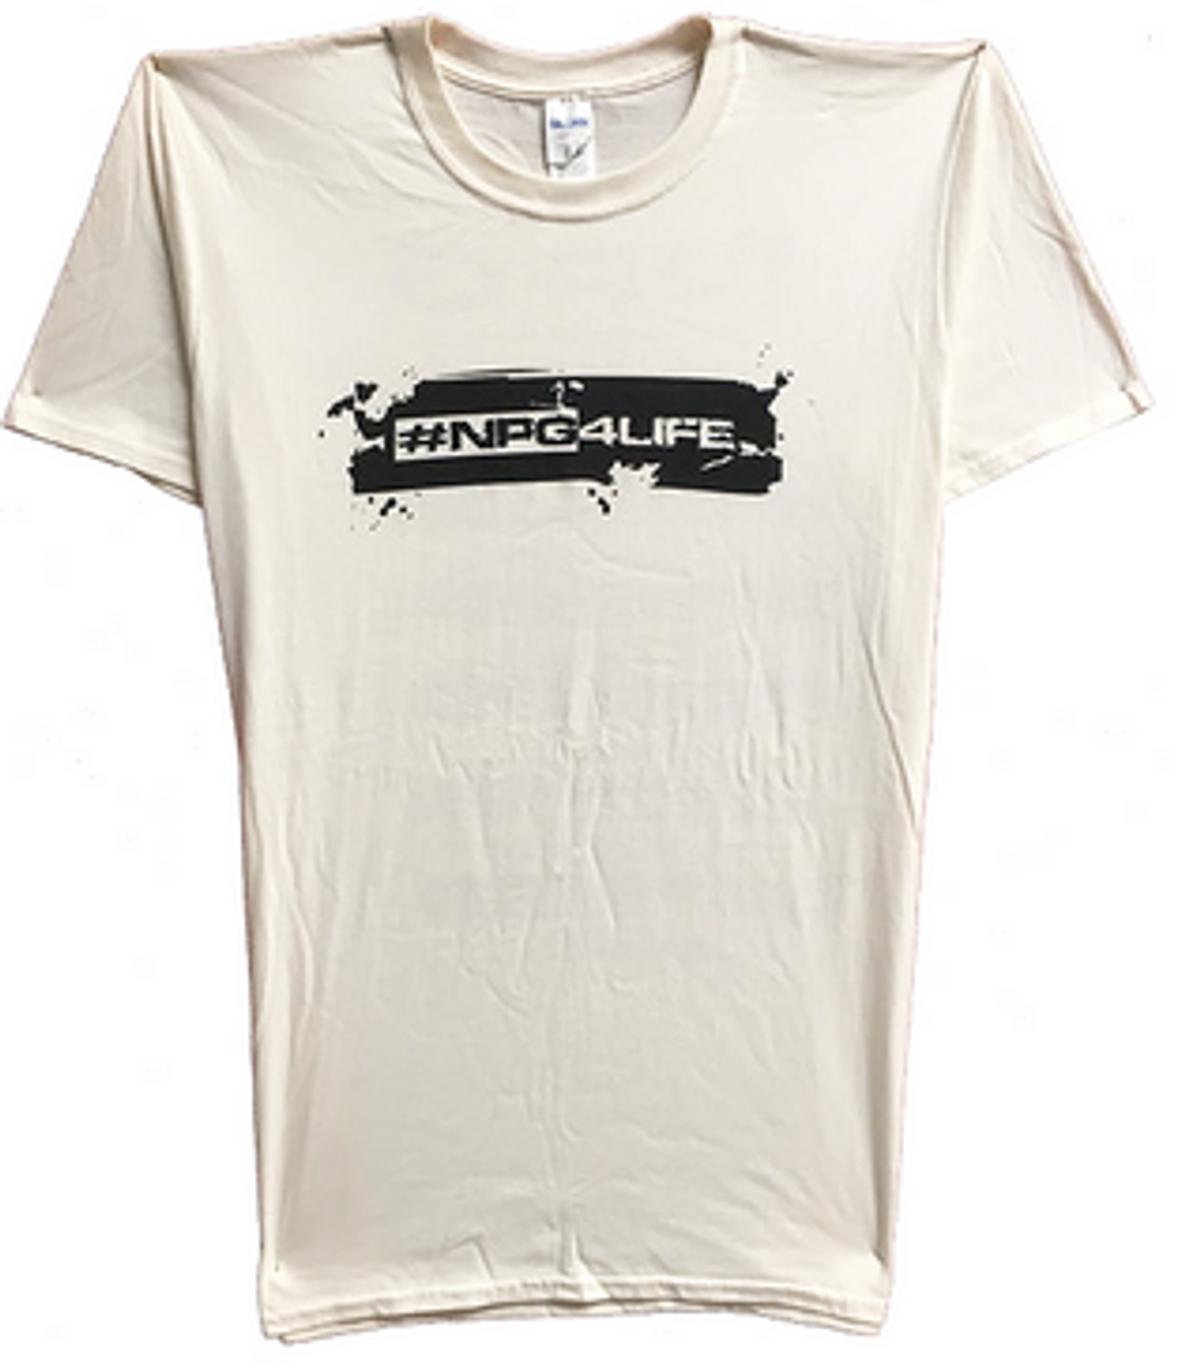 Natural NPG4LIFE T-Shirt - New Power Generation